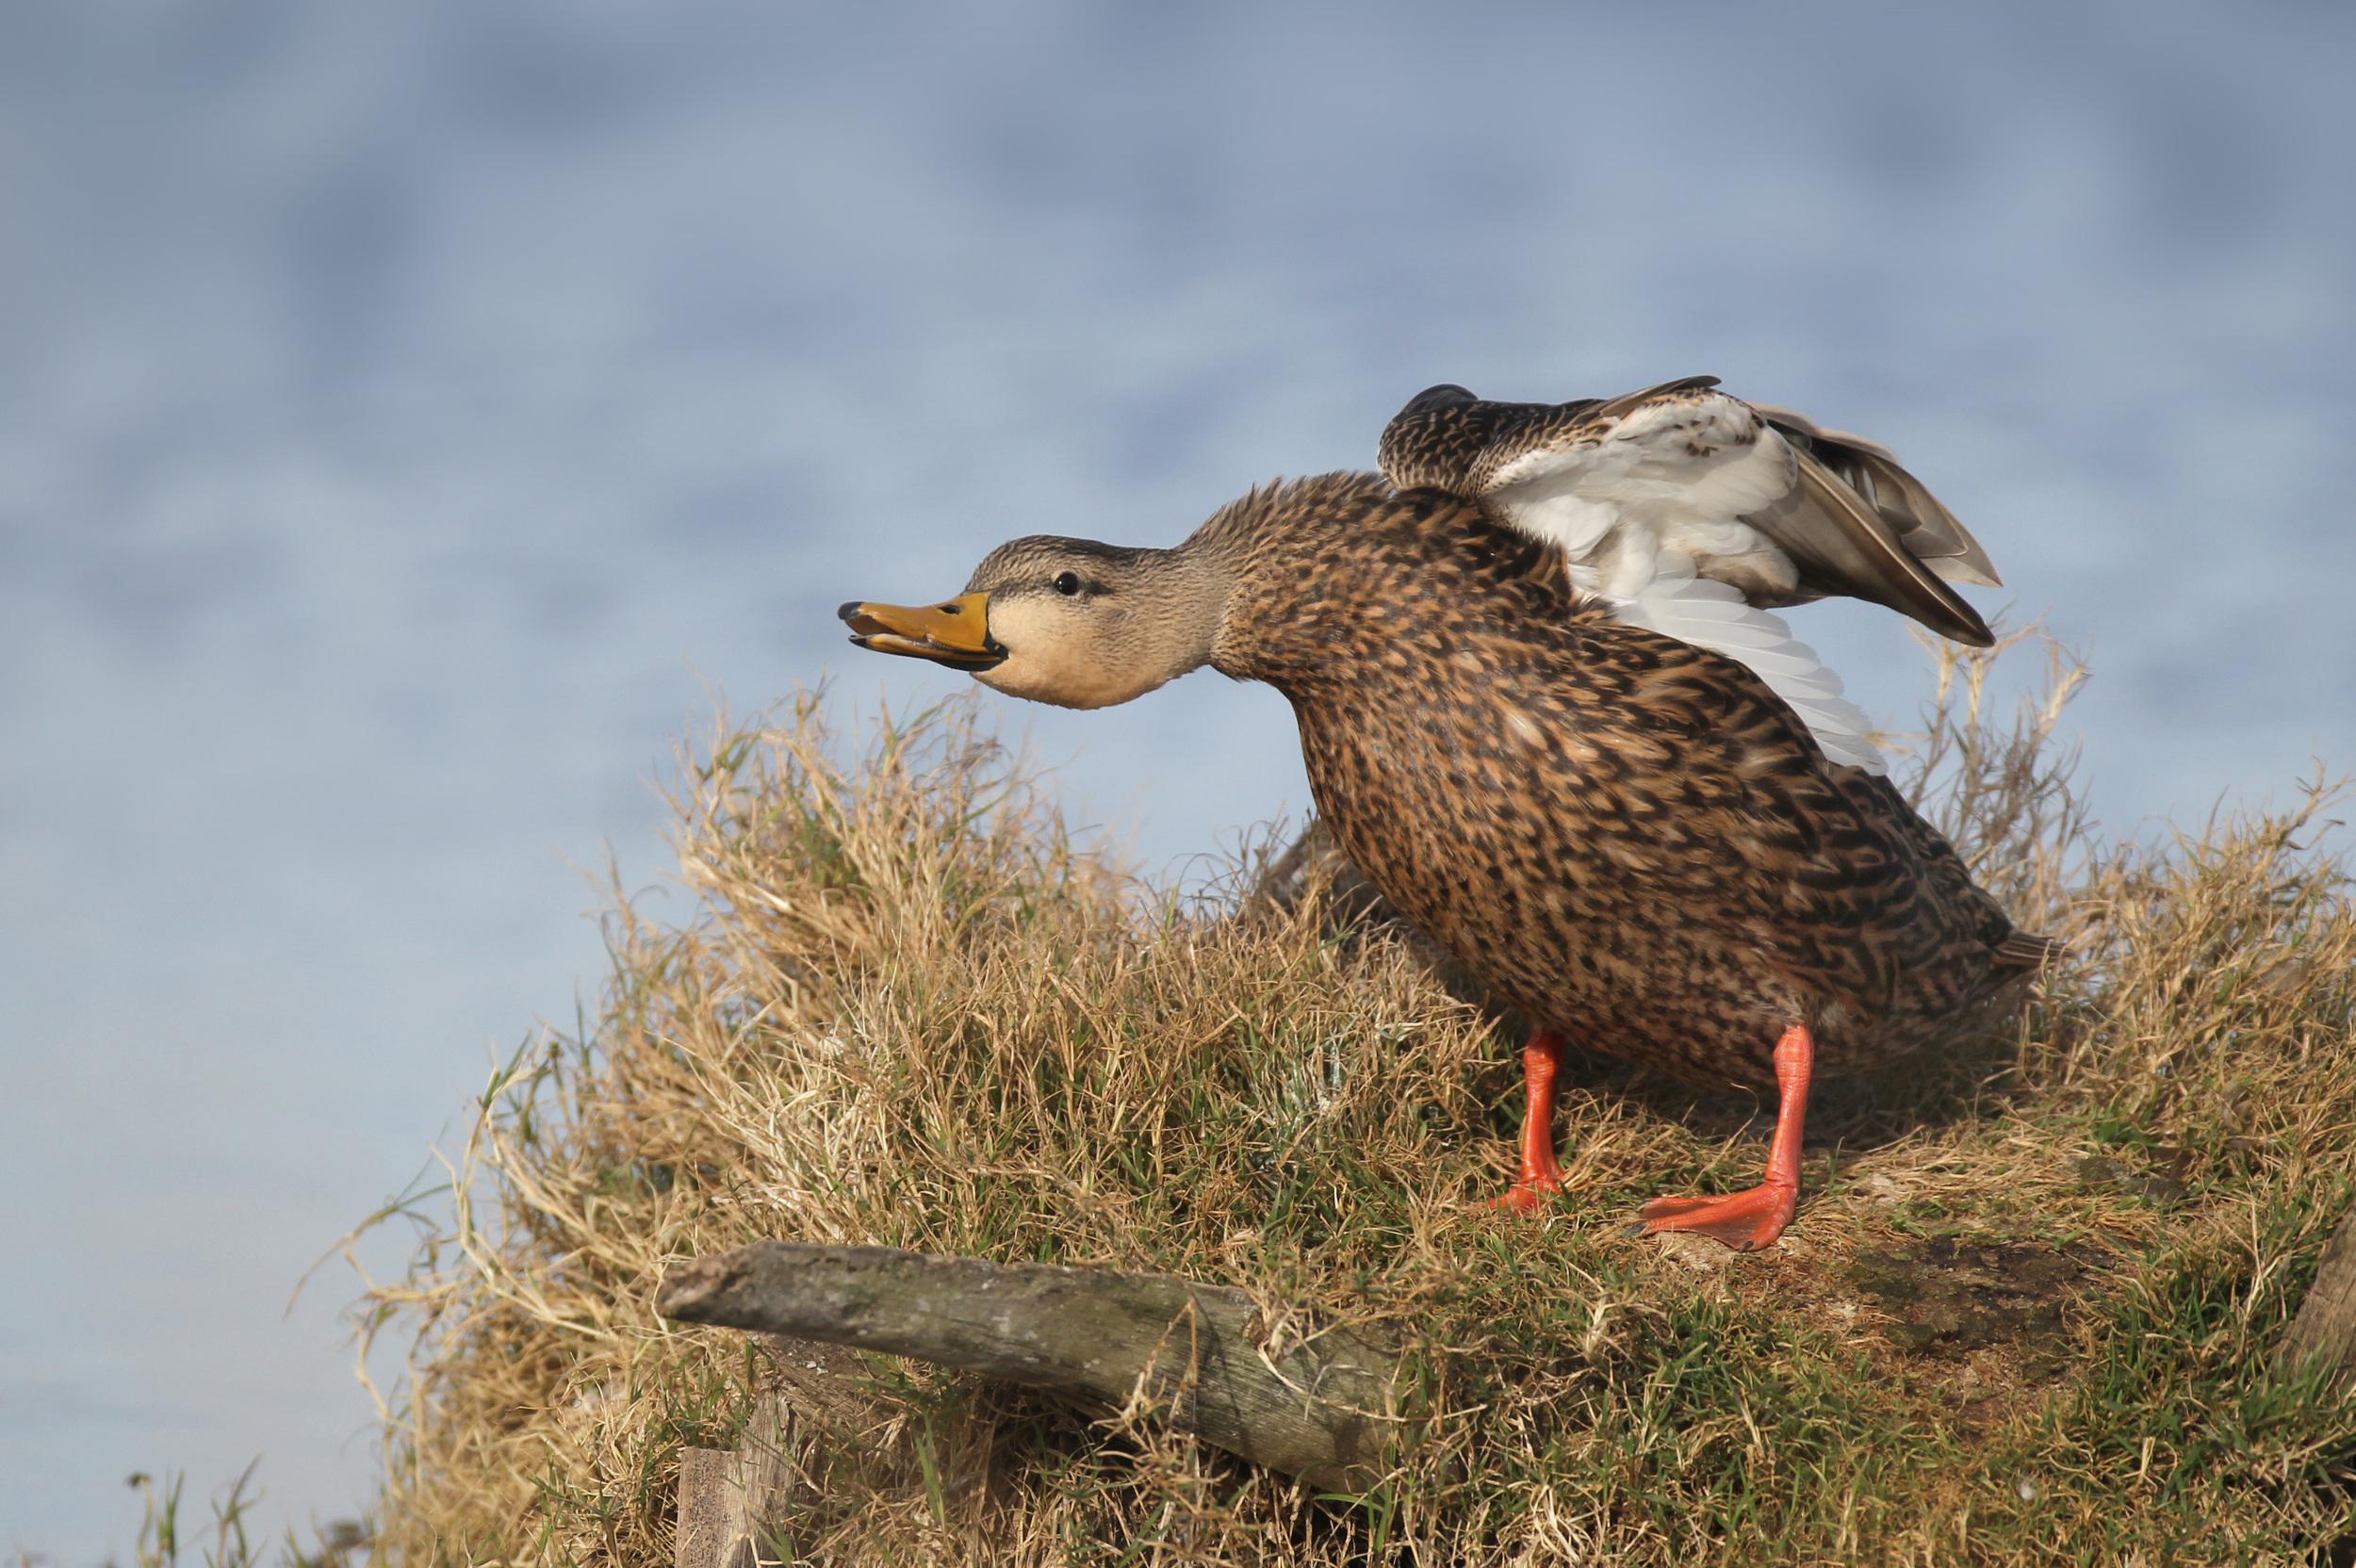 viera_wetlands_mottled_duck_EI8C0181751b.jpg